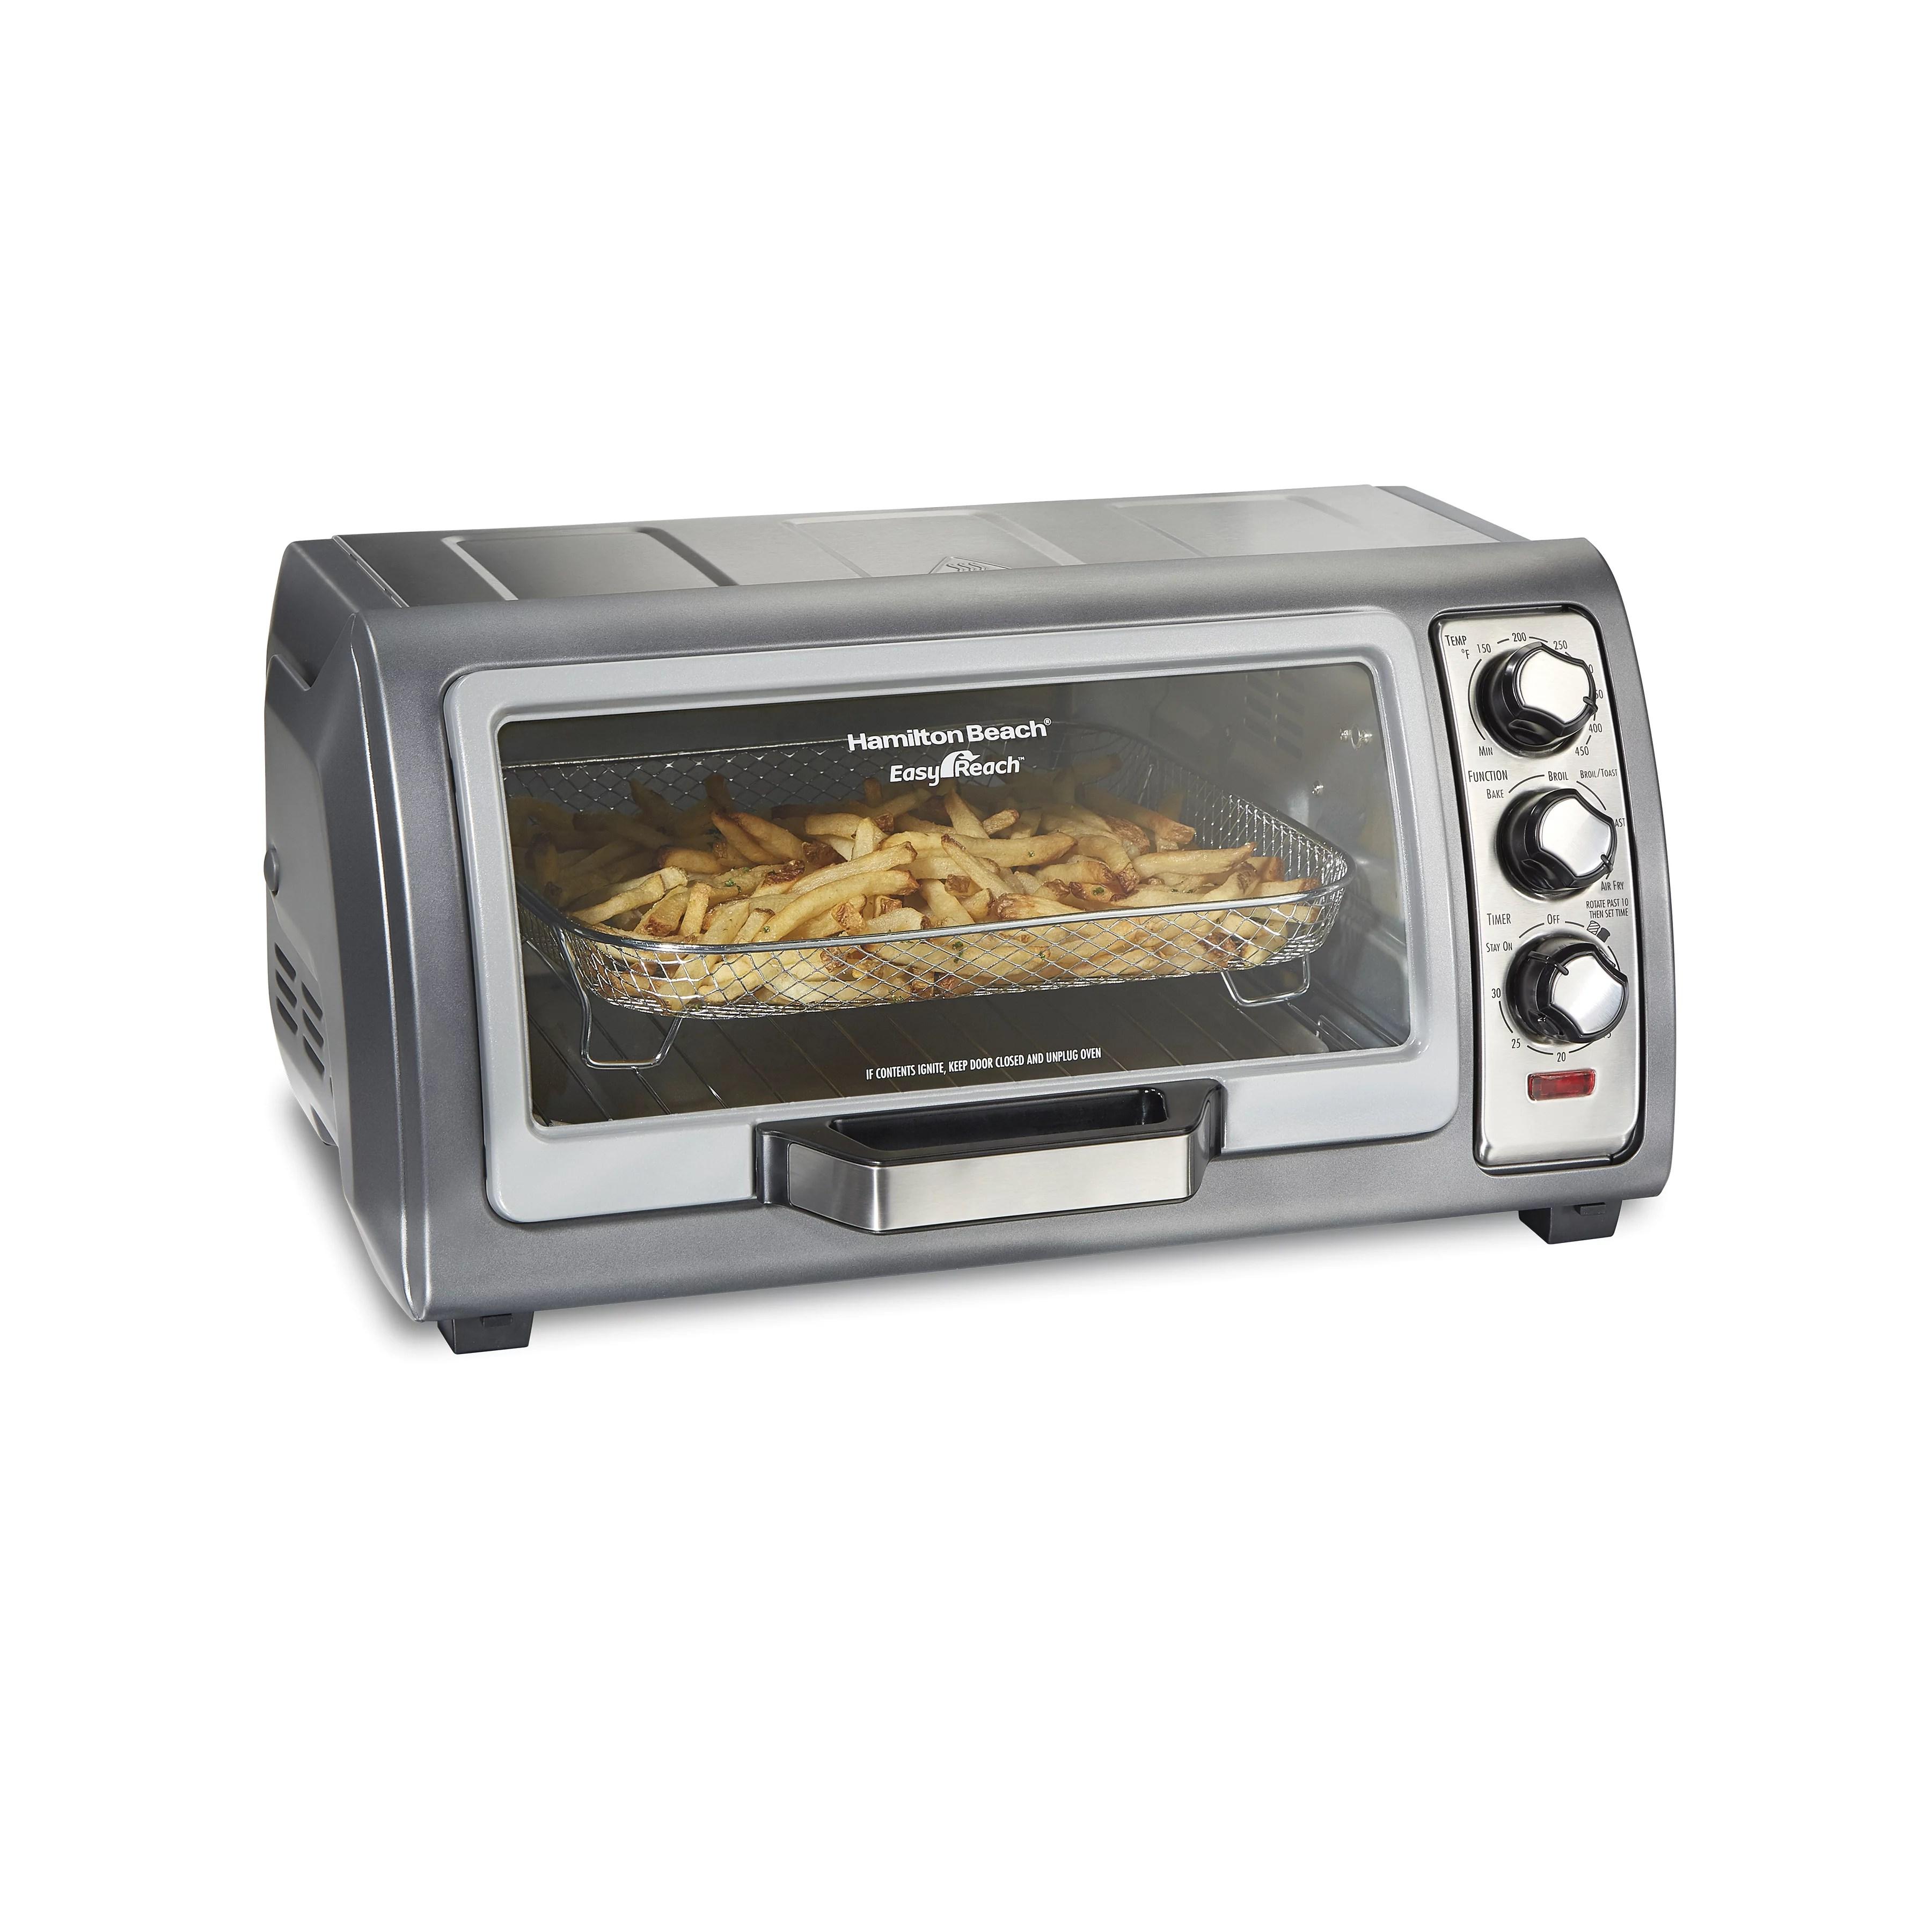 hamilton beach sure crisp air fryer toaster oven with easy reach door 6 slice capacity stainless steel 31523